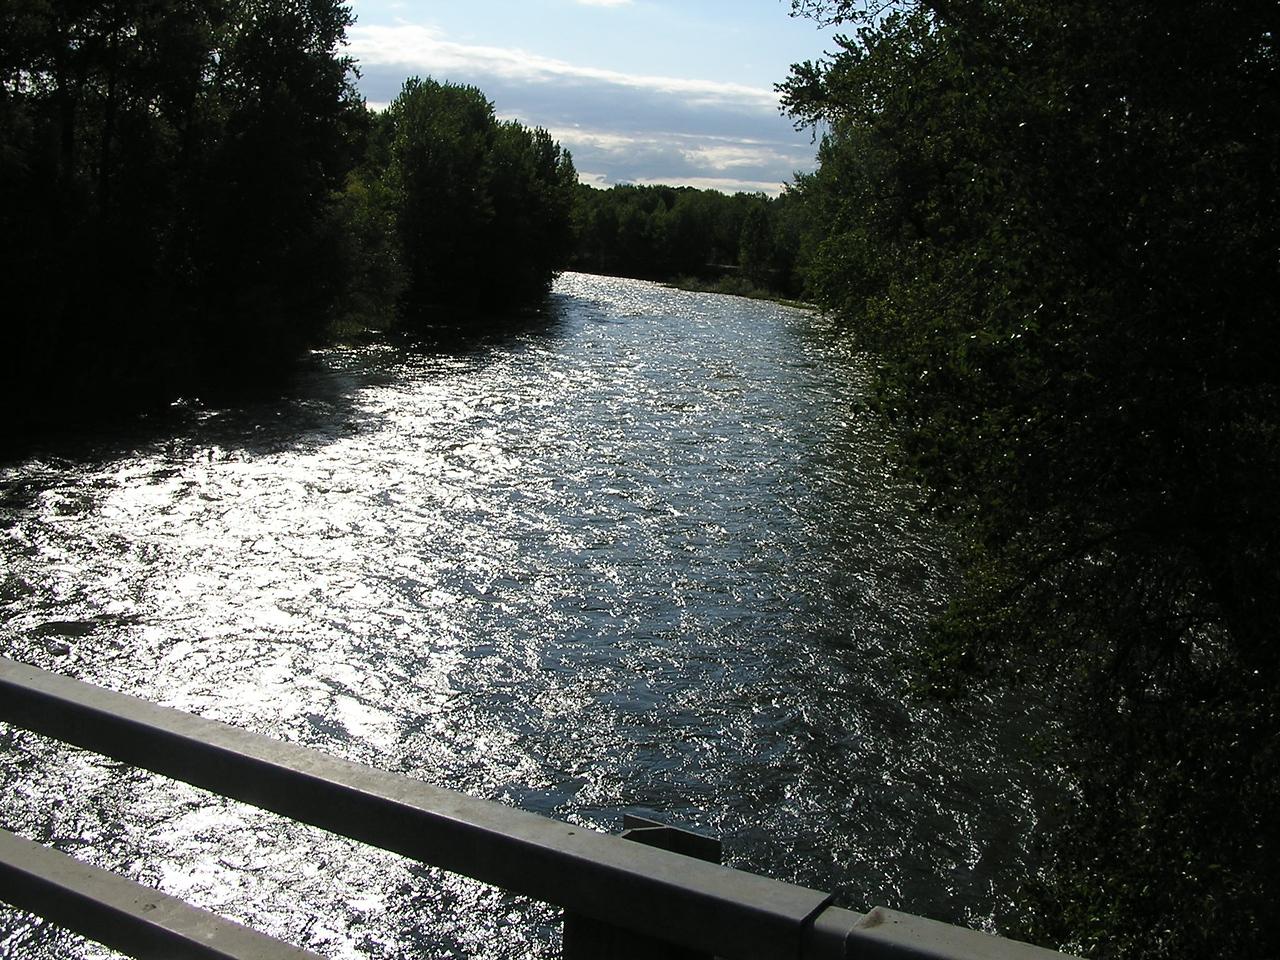 07 05 13 Eburg Riverfront 010